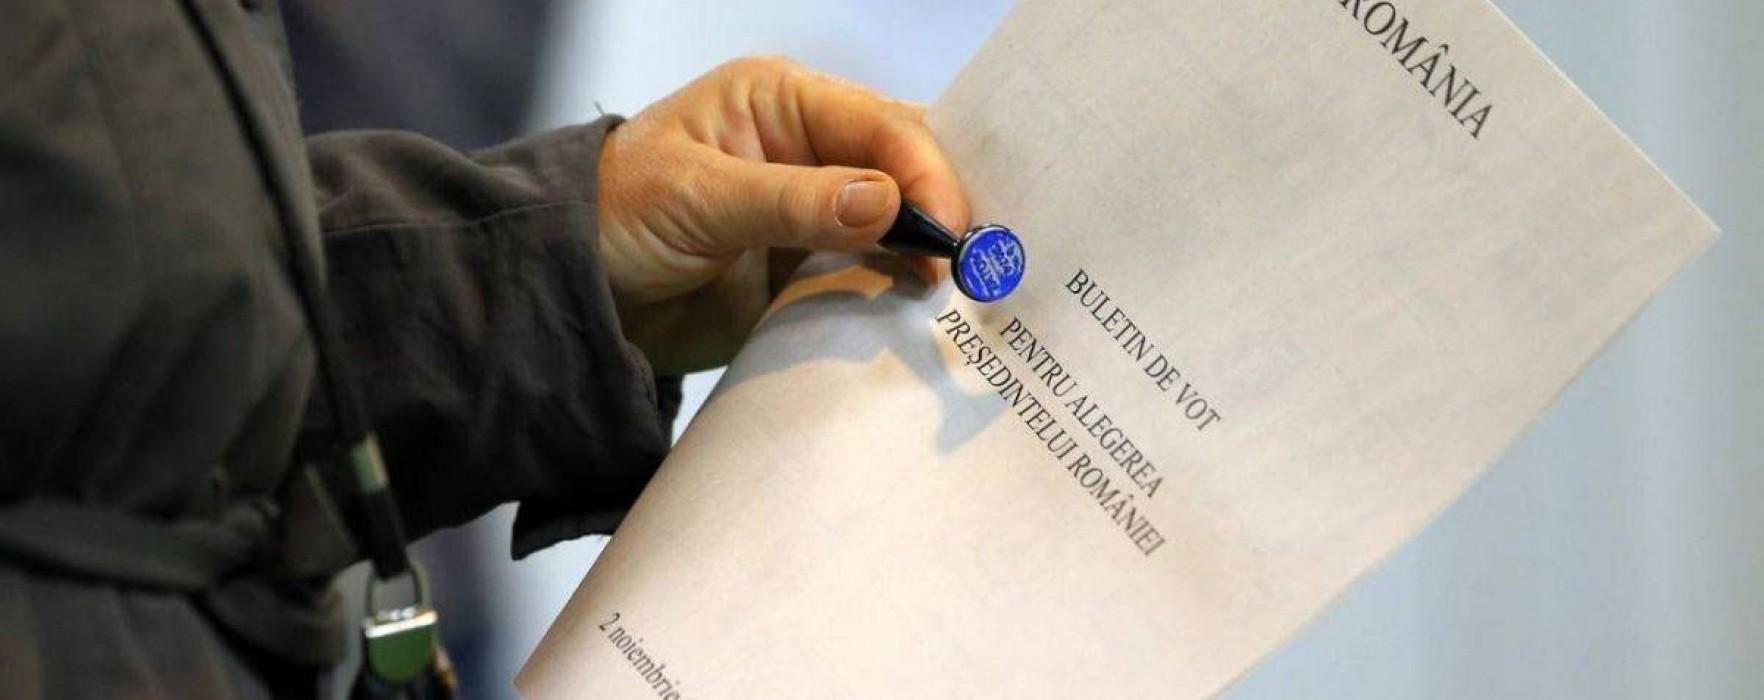 Dâmboviţa: Ponta – 58,08%, Iohannis – 41,92%, conform rezultatelor finale BEJ